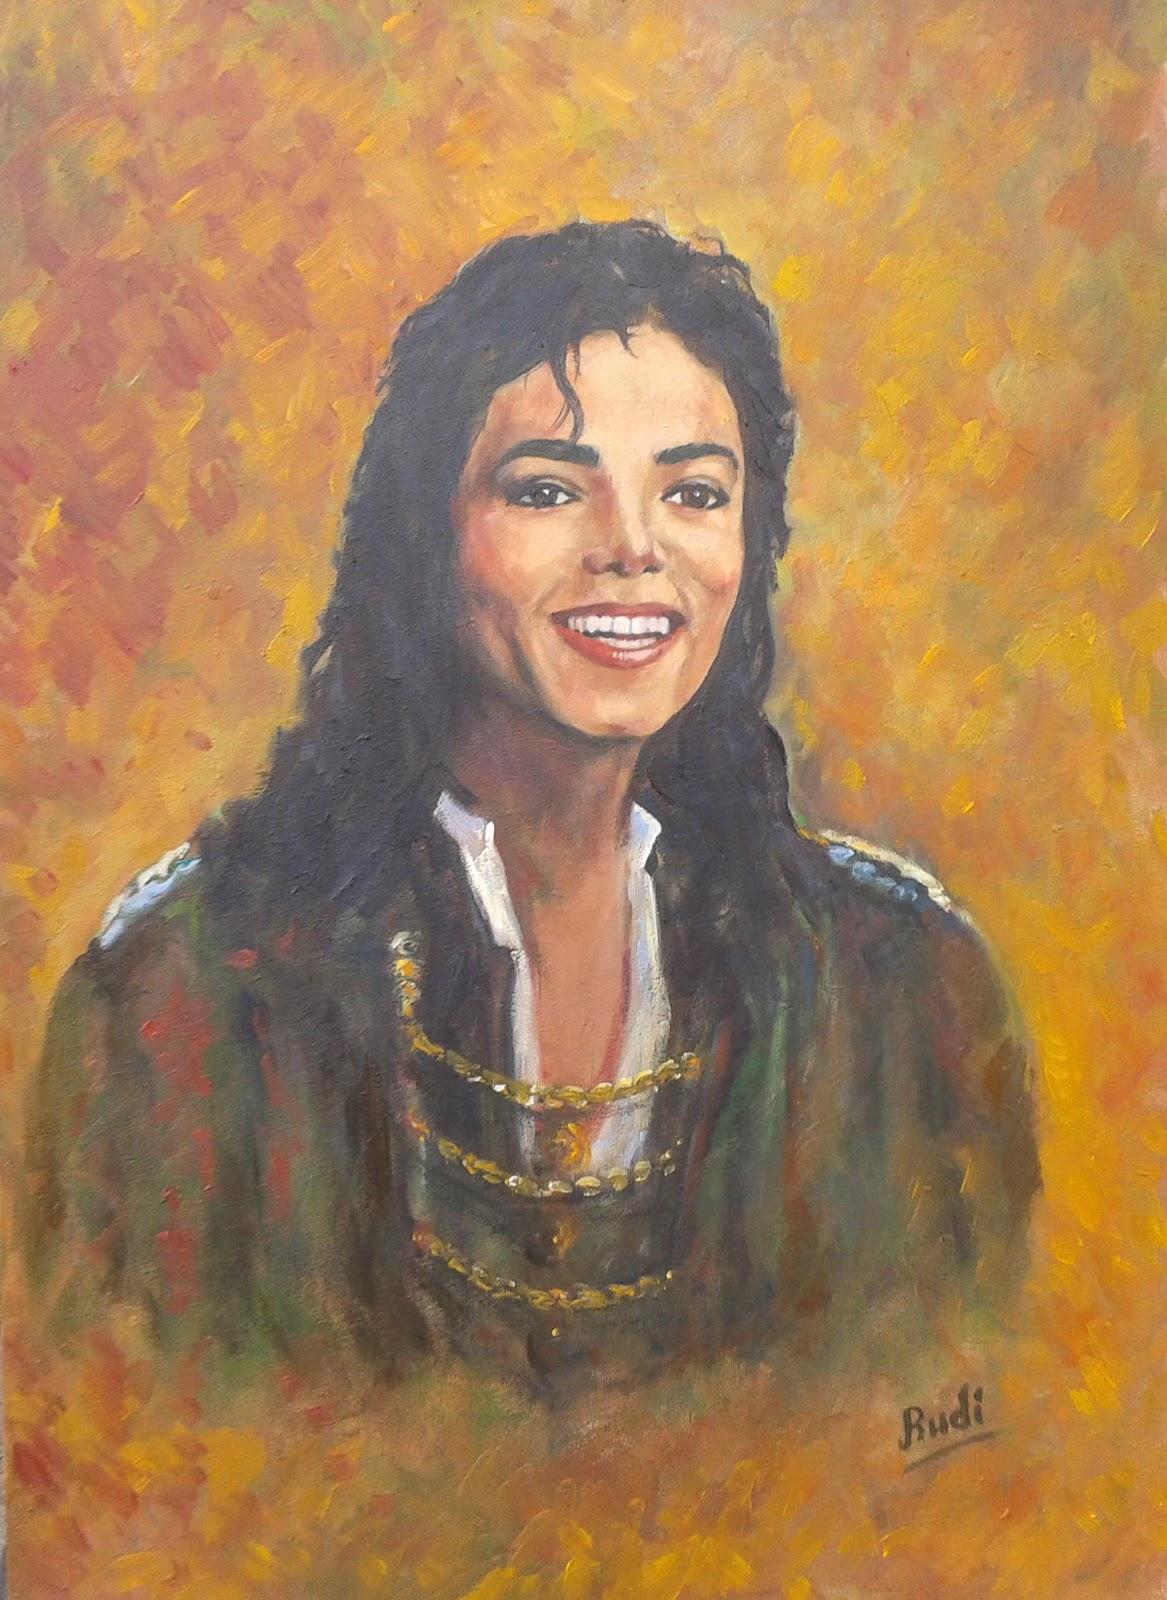 Homenaje retrato óleo a Michael Jackson.